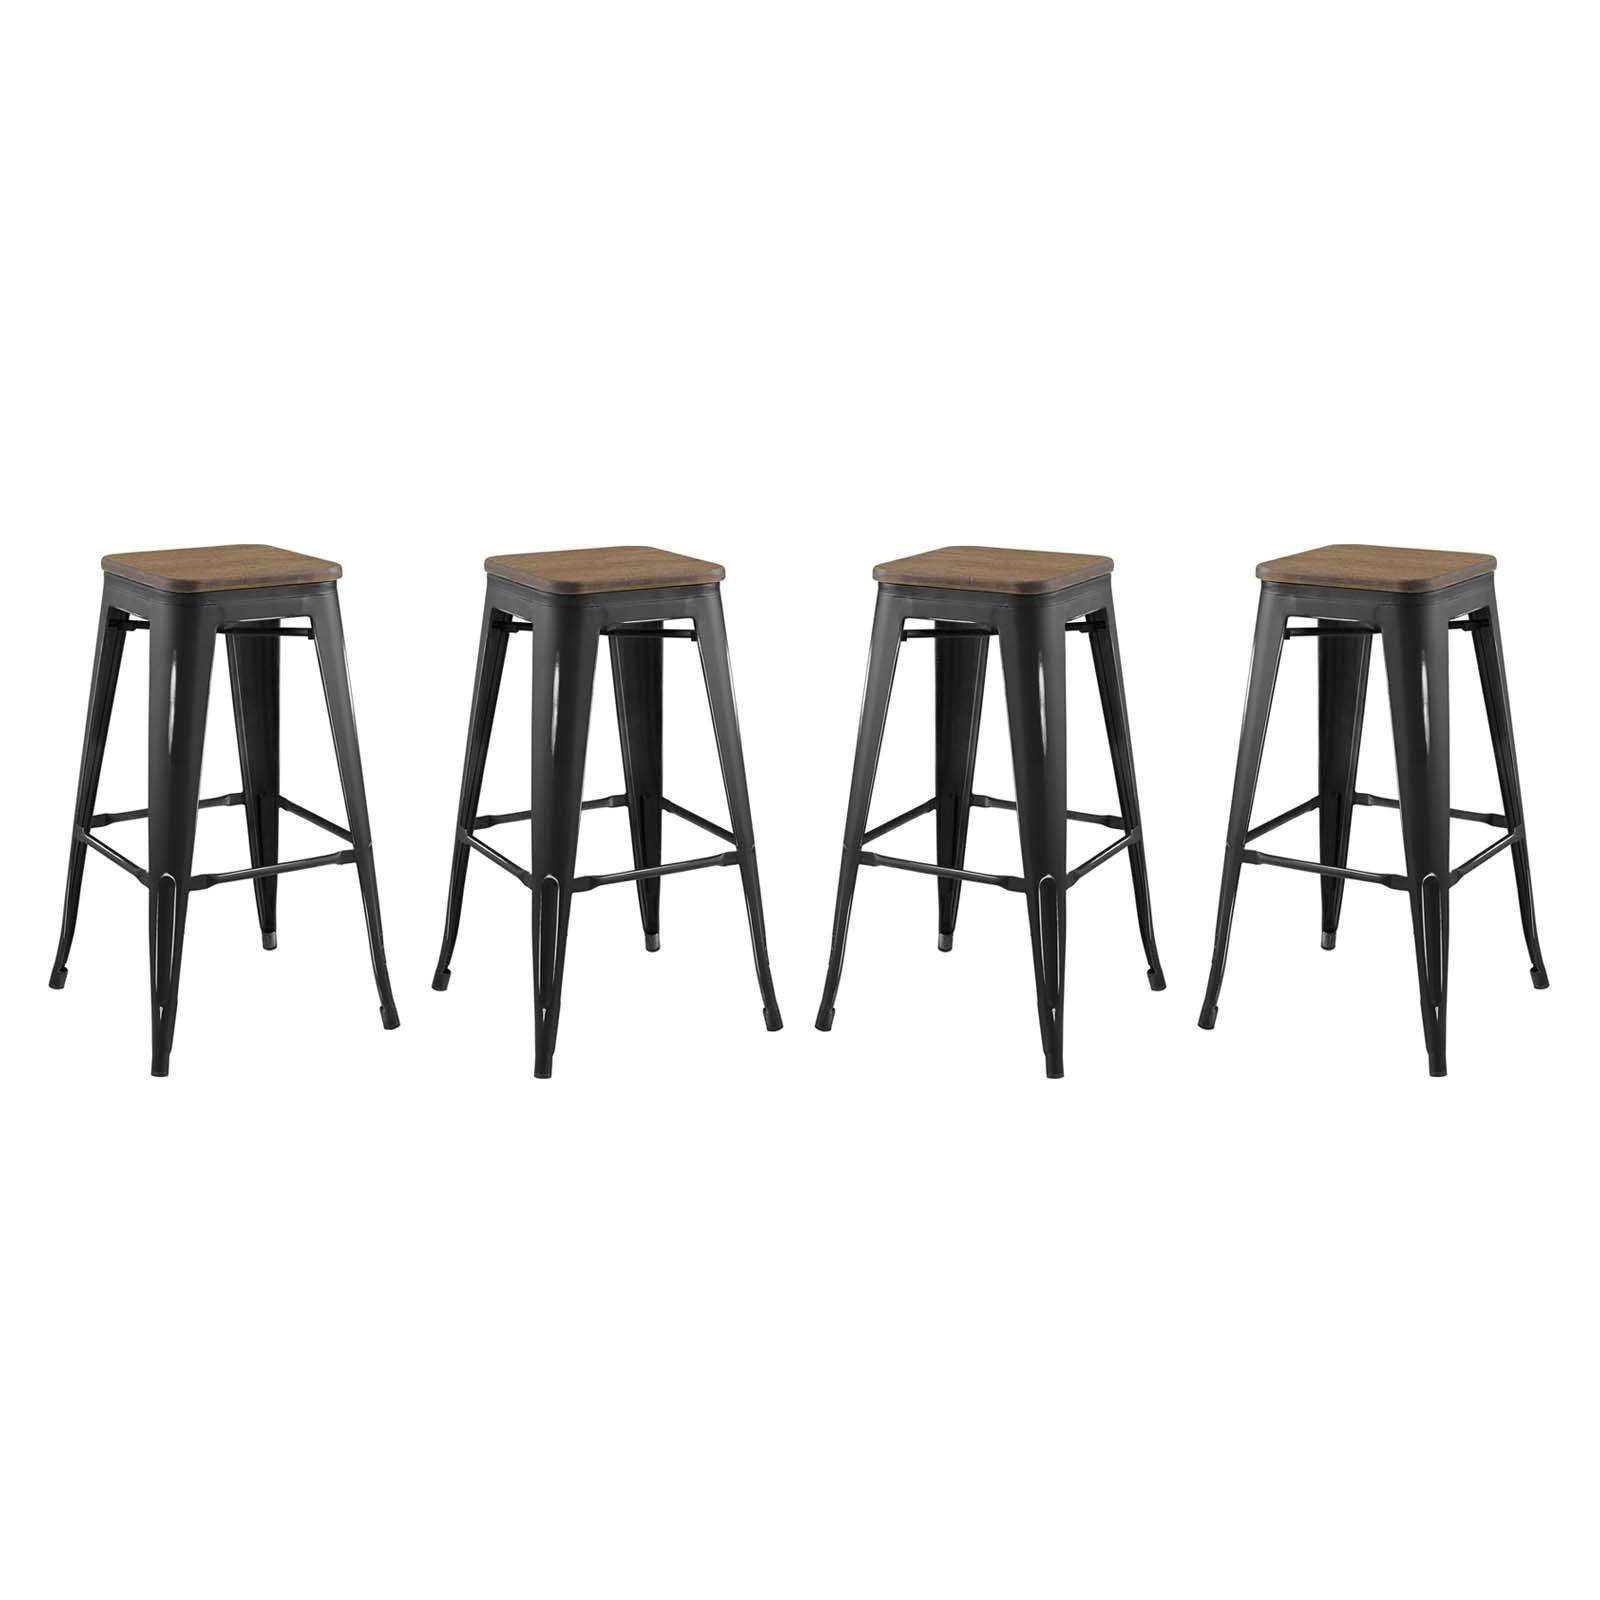 Promenade Bar Stool Set Of 4 In Black In 2021 Metal Bar Stools Modern Bar Stools Metal Counter Stools Bar stool sets of 4